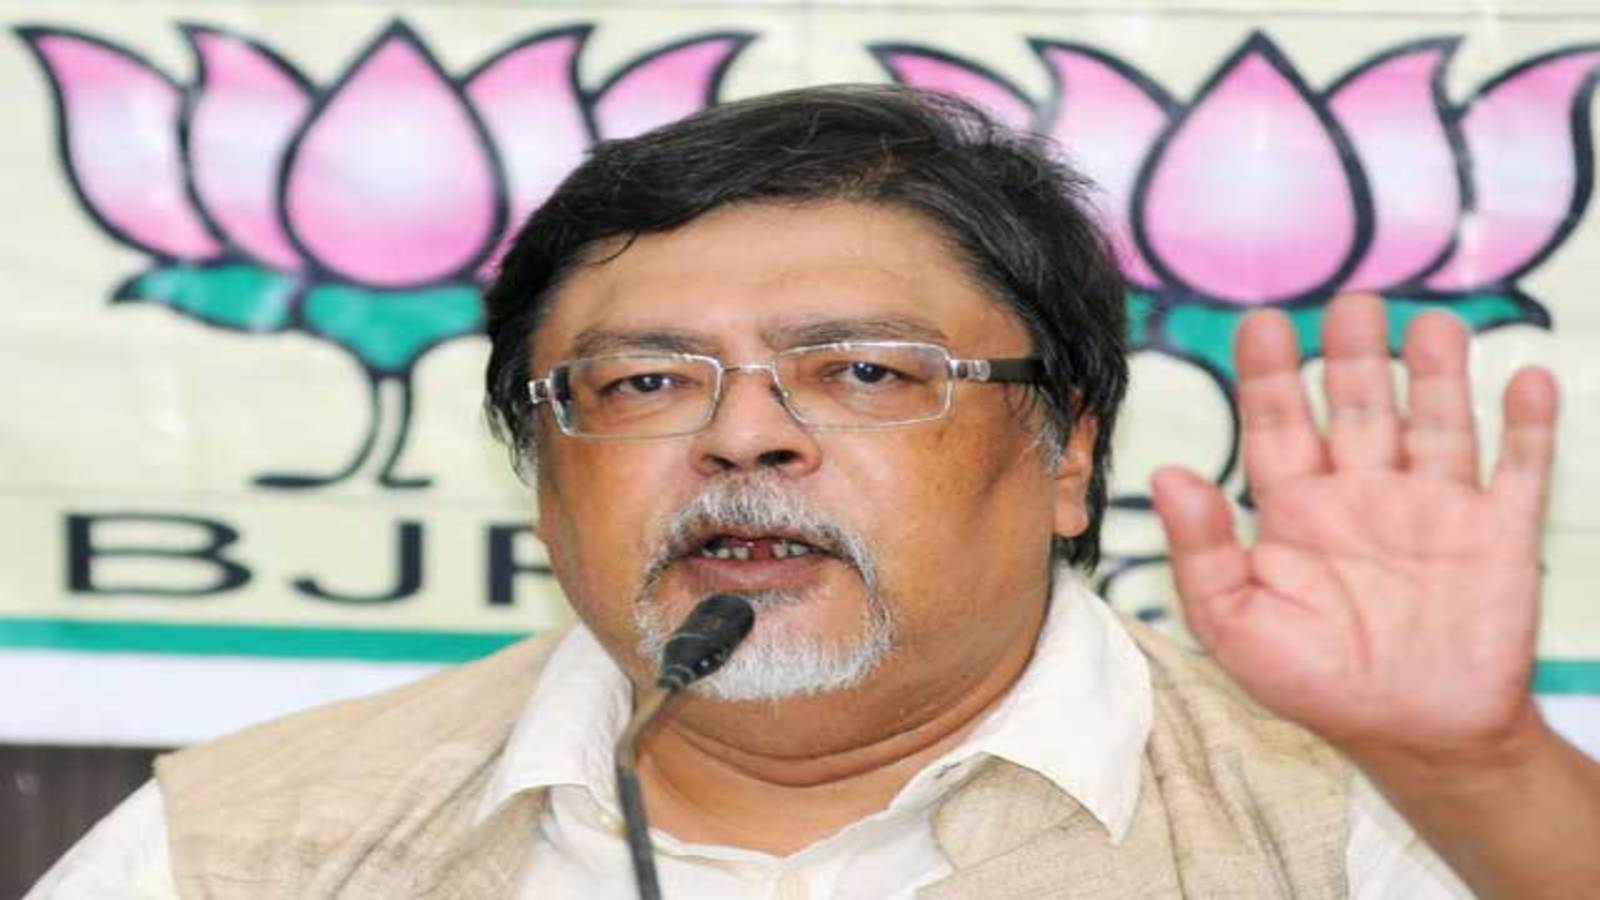 Breaking- Former Rajya Sabha MP, Journalist Chandan Mitra died at the age of 66